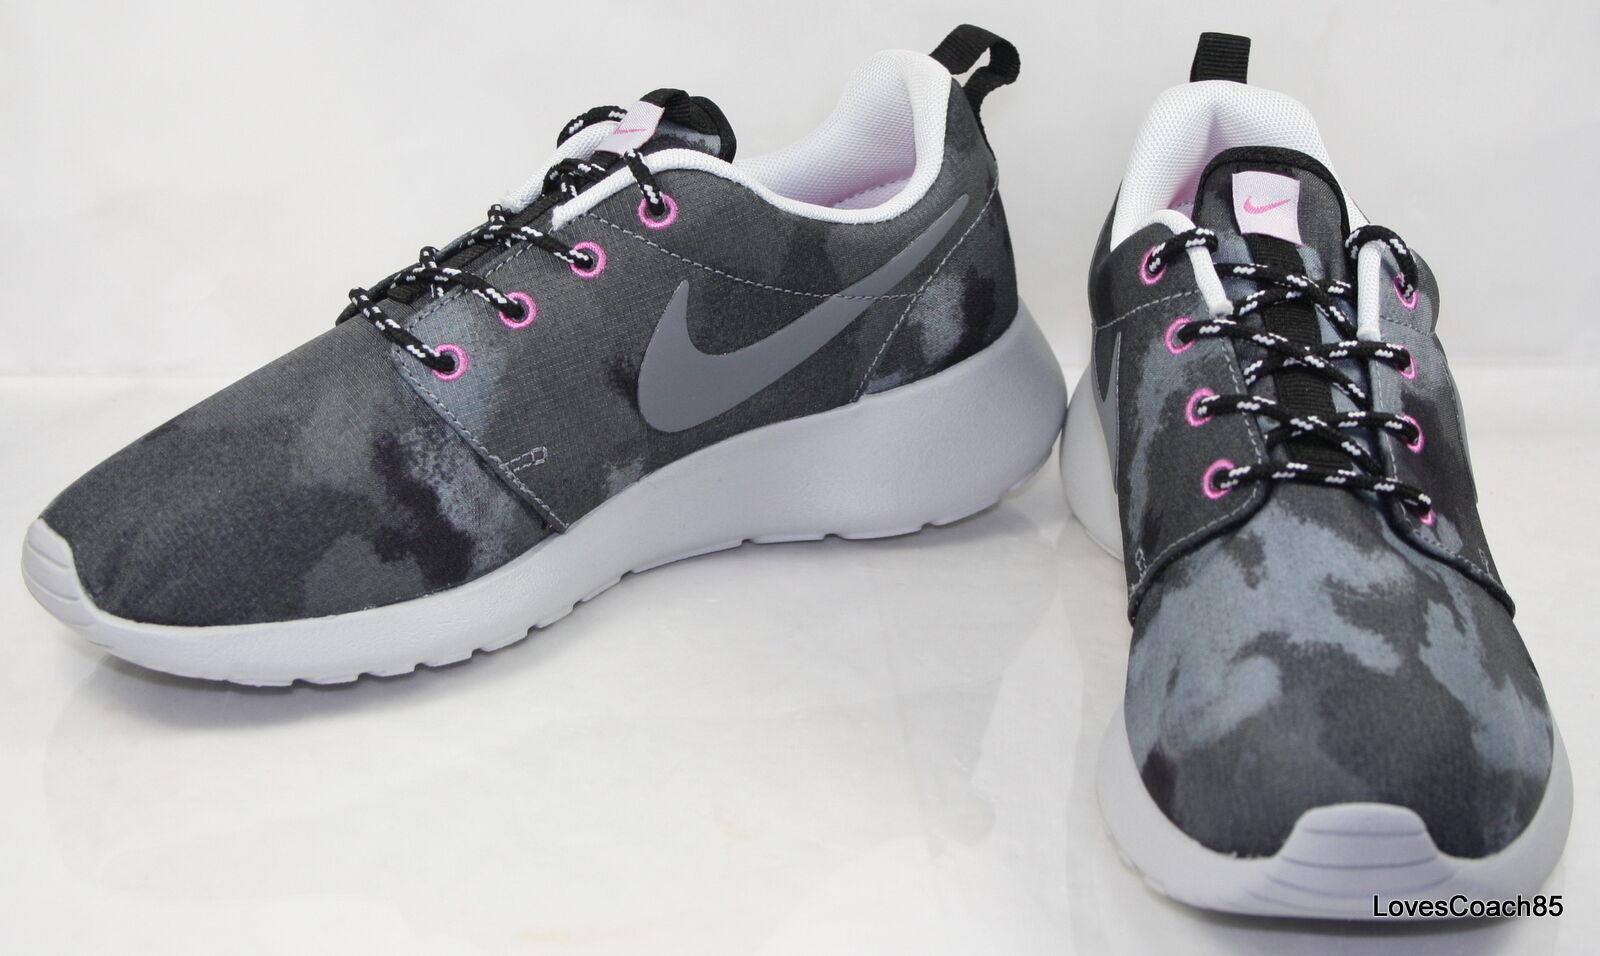 Wmns Nike Rosherun Print Size 6.5 Black Cool Grey 599432-001 599432-001 599432-001 New in Box 3275ea